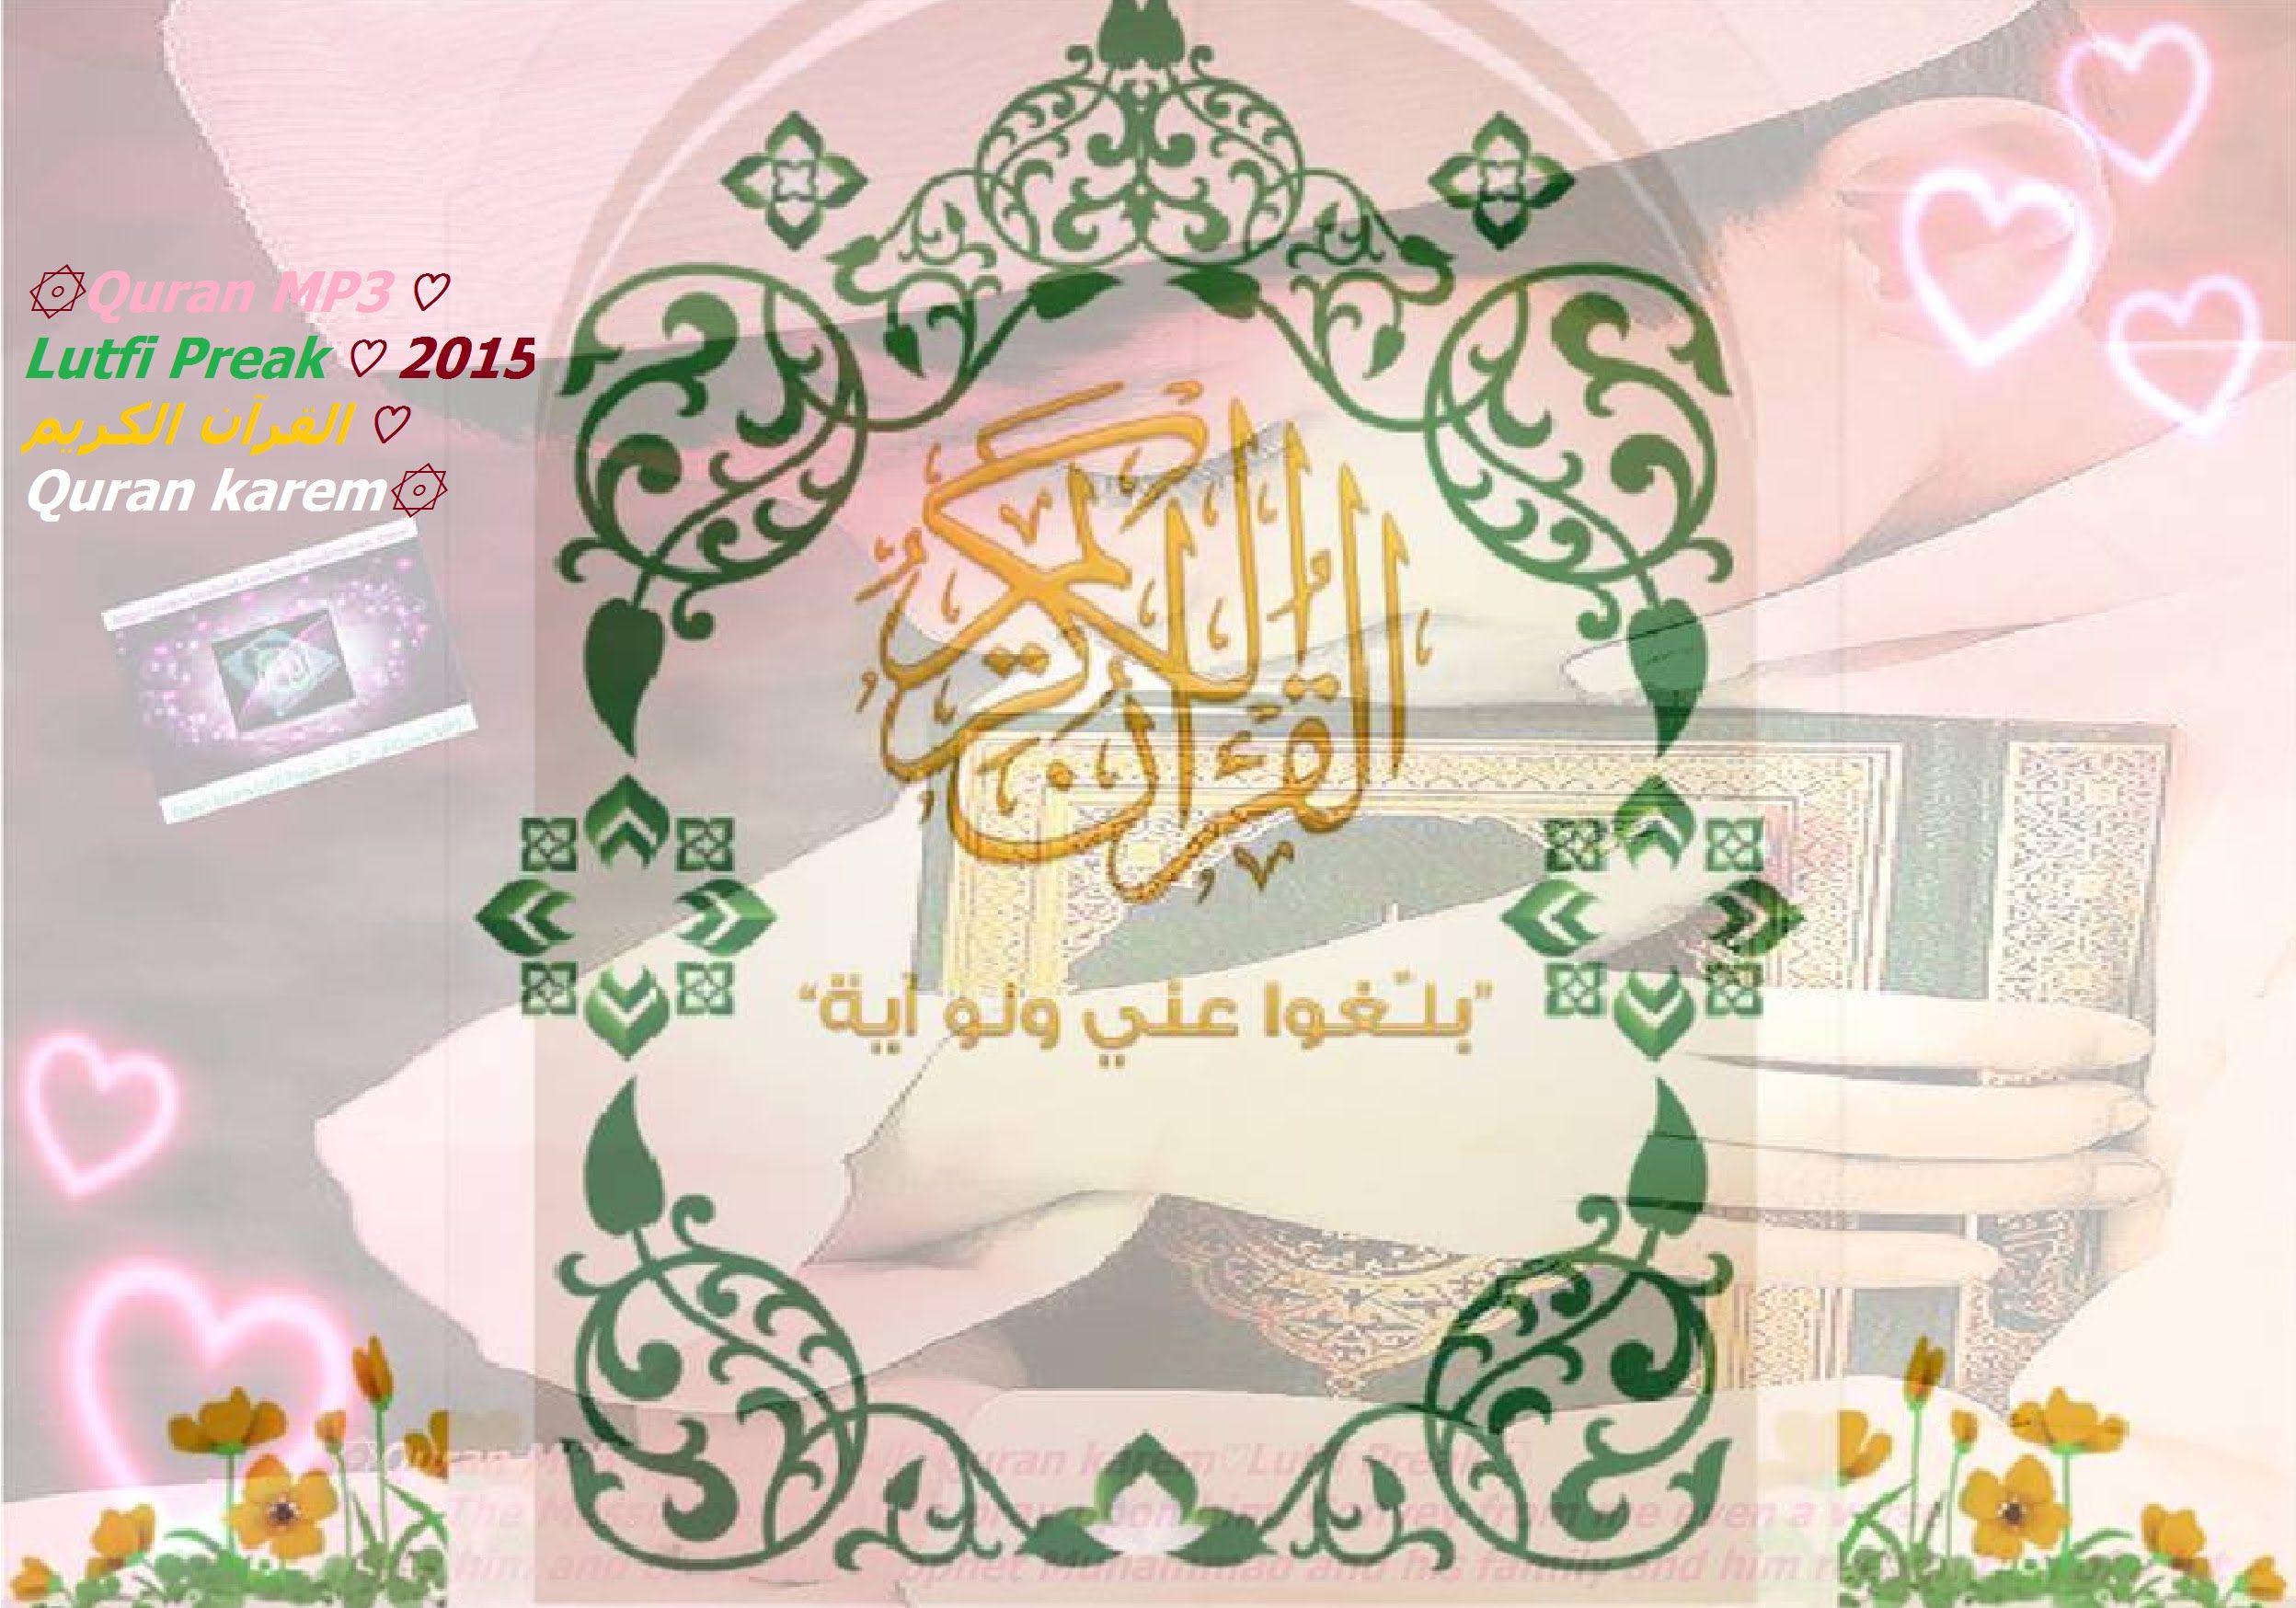 تلاوة سورة Sura النساء Yasser Al Dosari An Nisaa Home Decor Decals Decor Home Decor